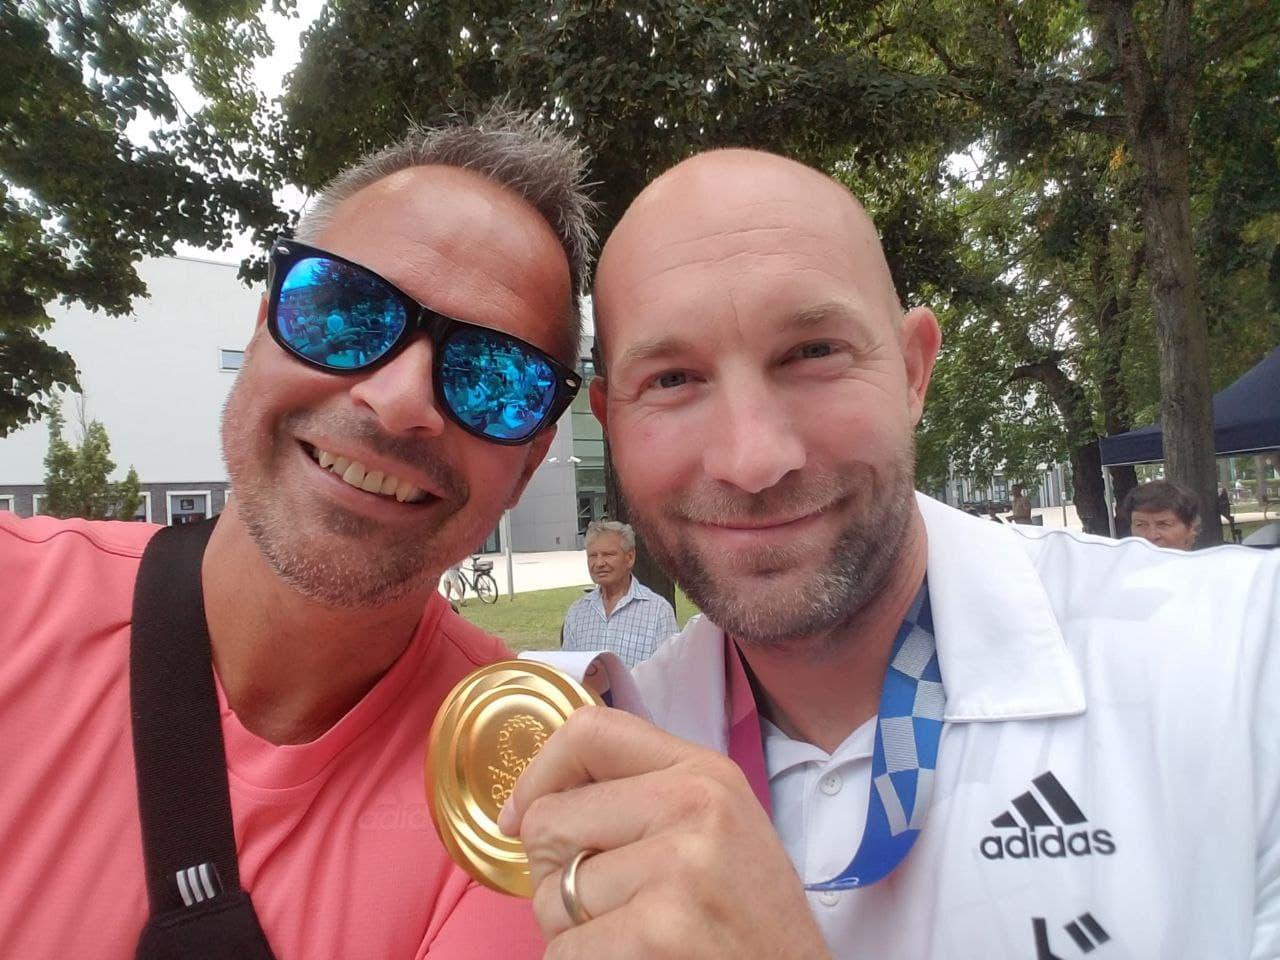 Olympiasieger Ronald Raue mit der Goldmedaille